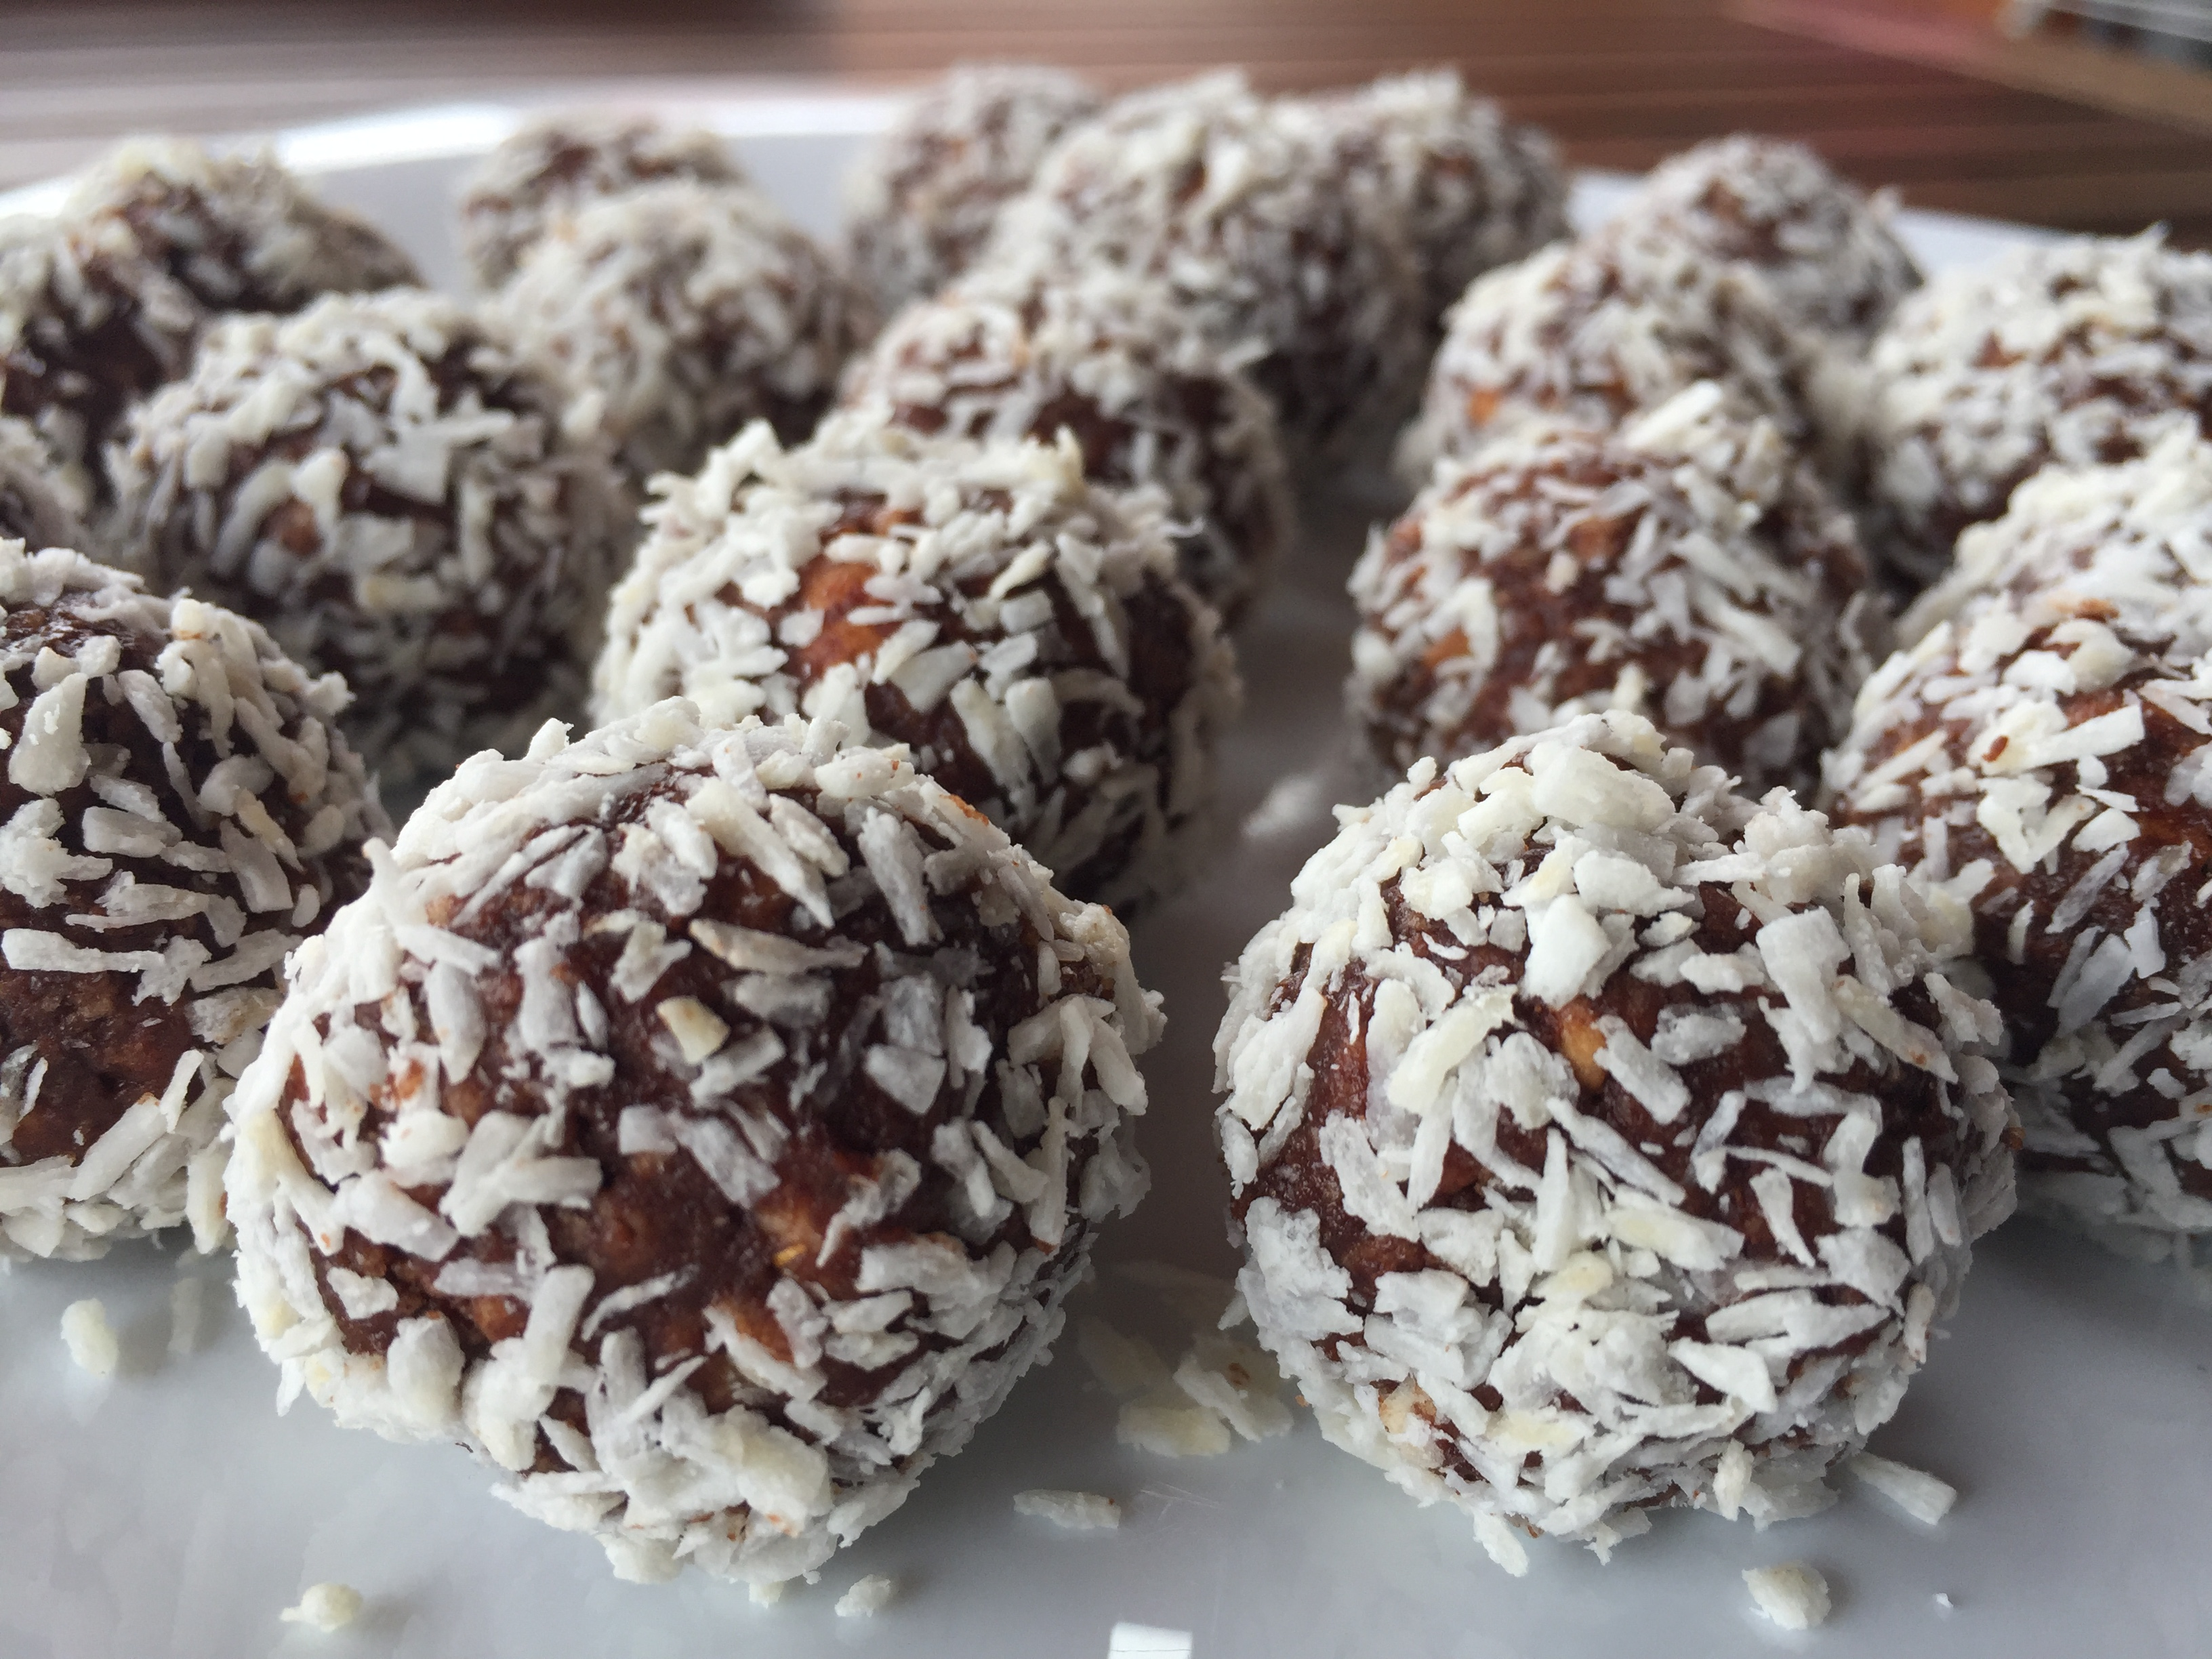 Slastne kokosove kroglice (ježki) brez glutena